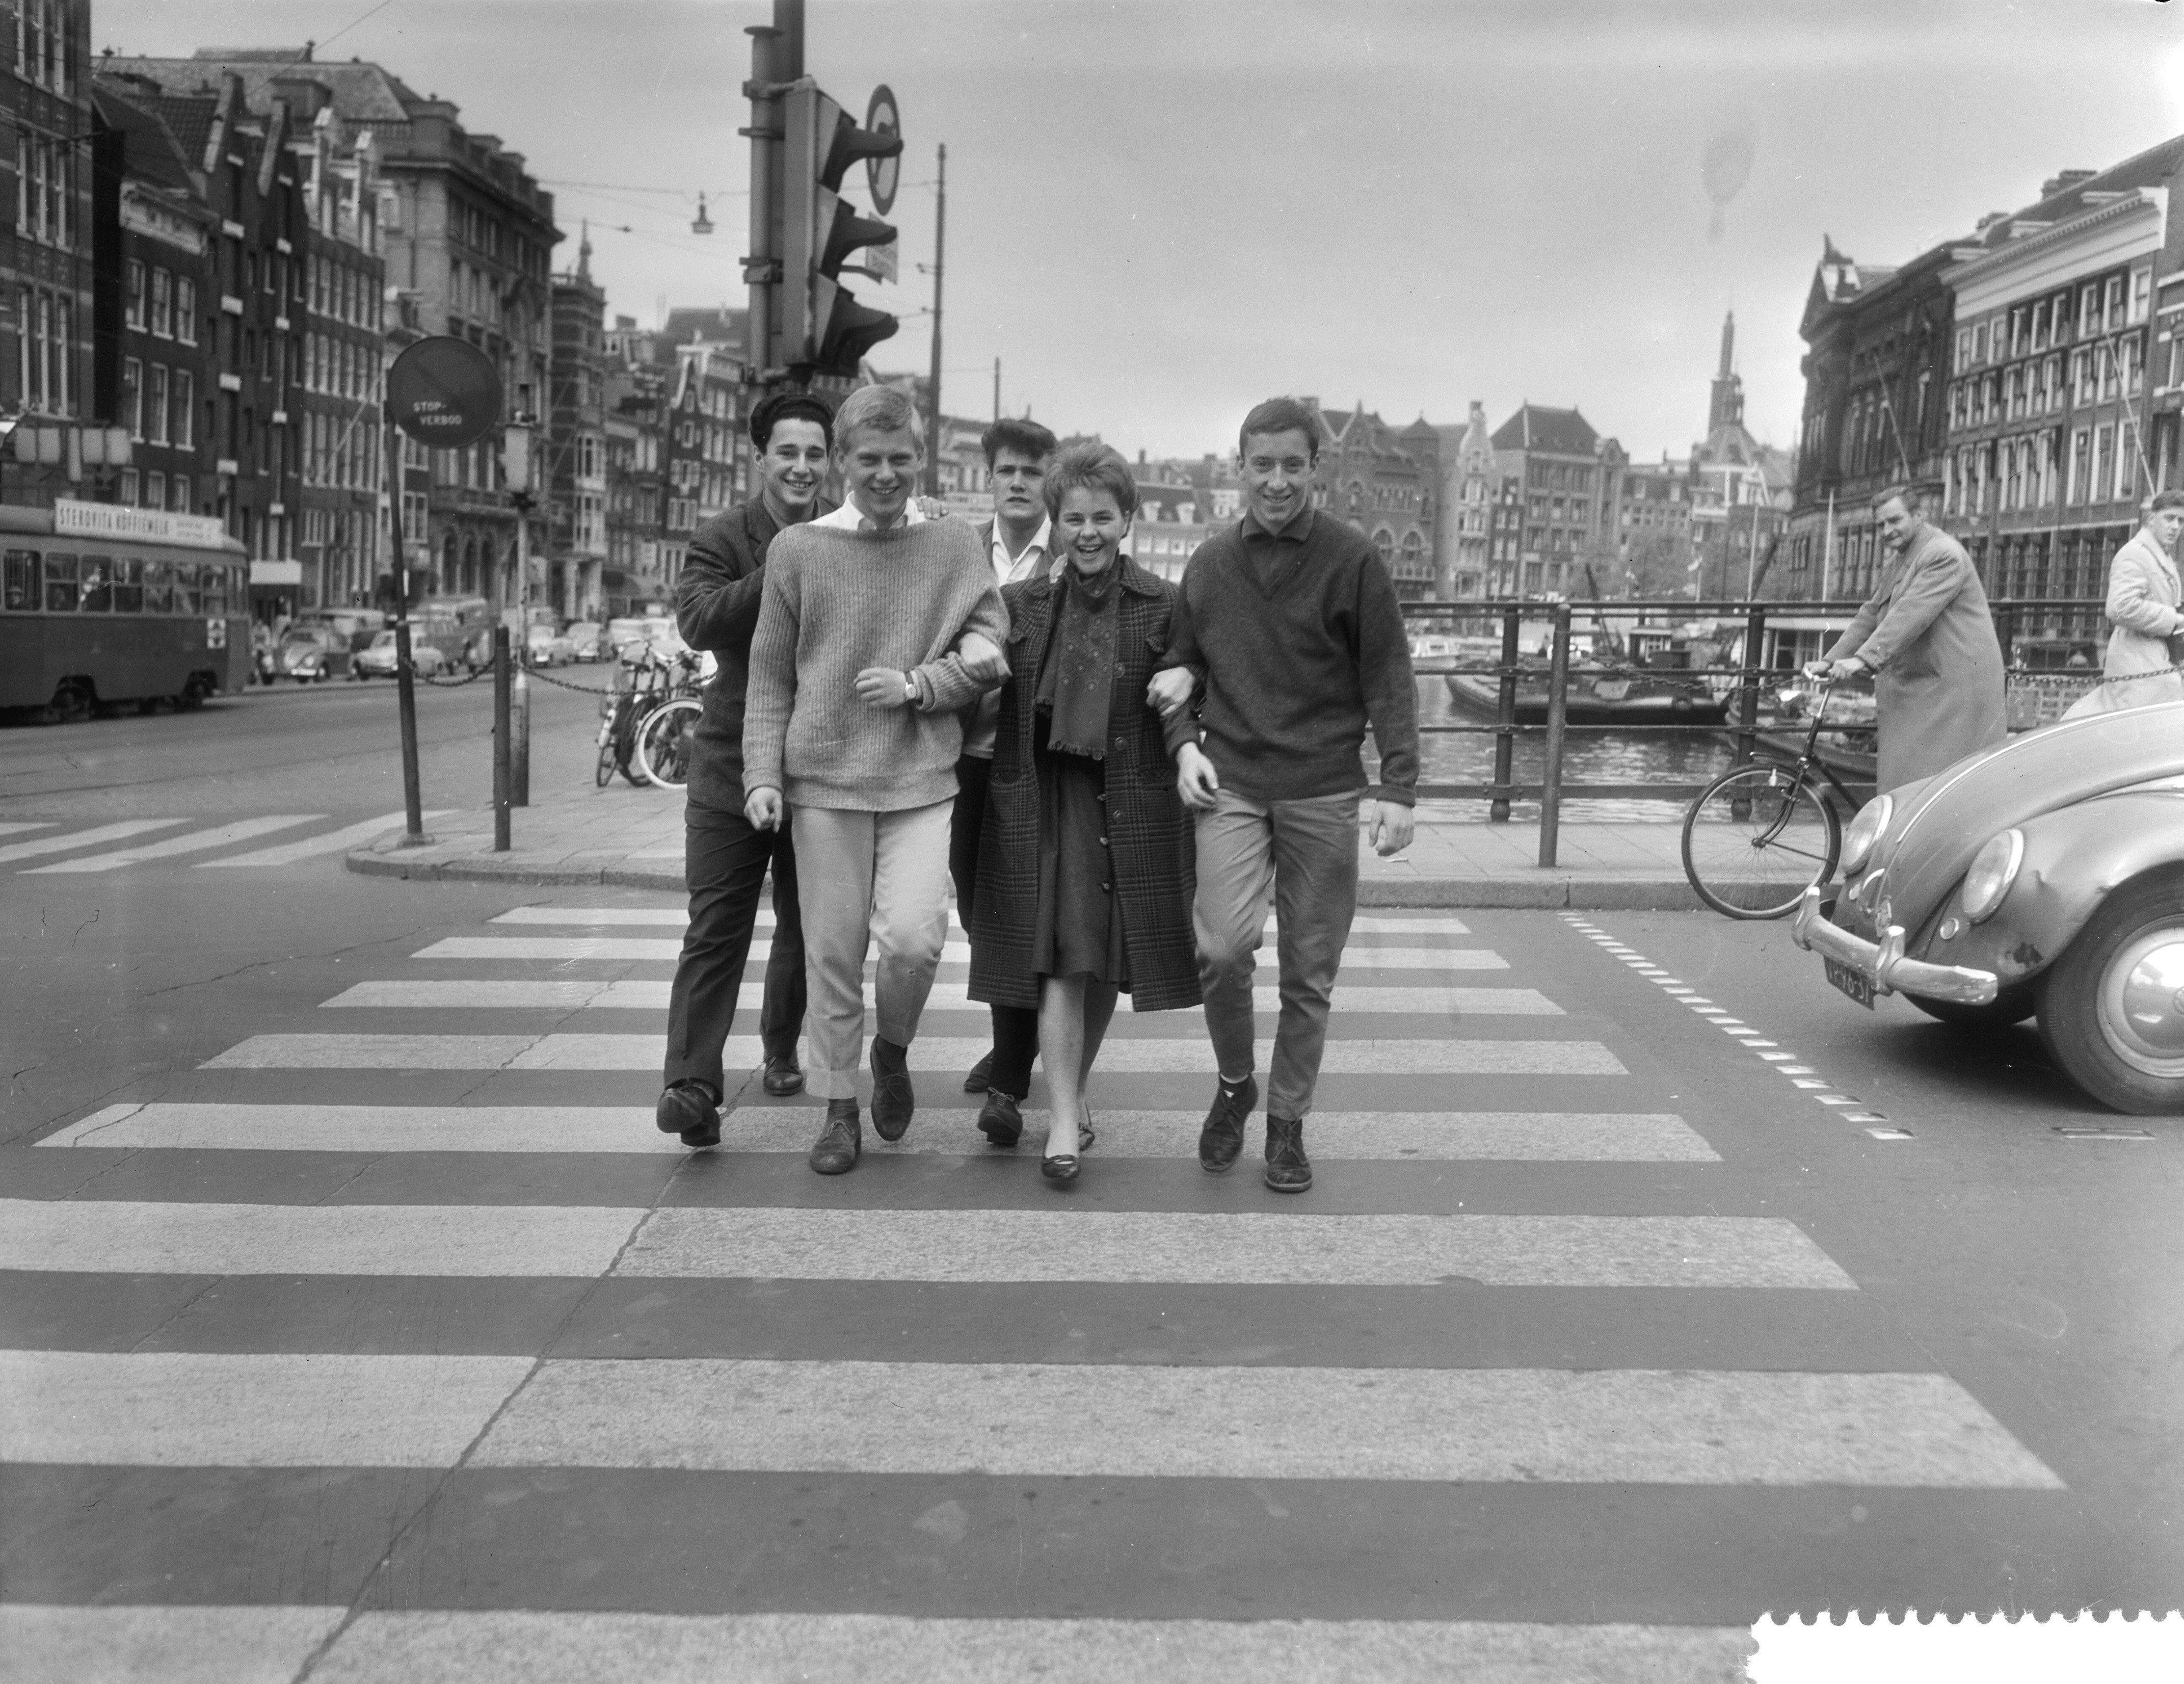 Conny Froboess Bilder file:duits filmsterretje conny froboess in amsterdam